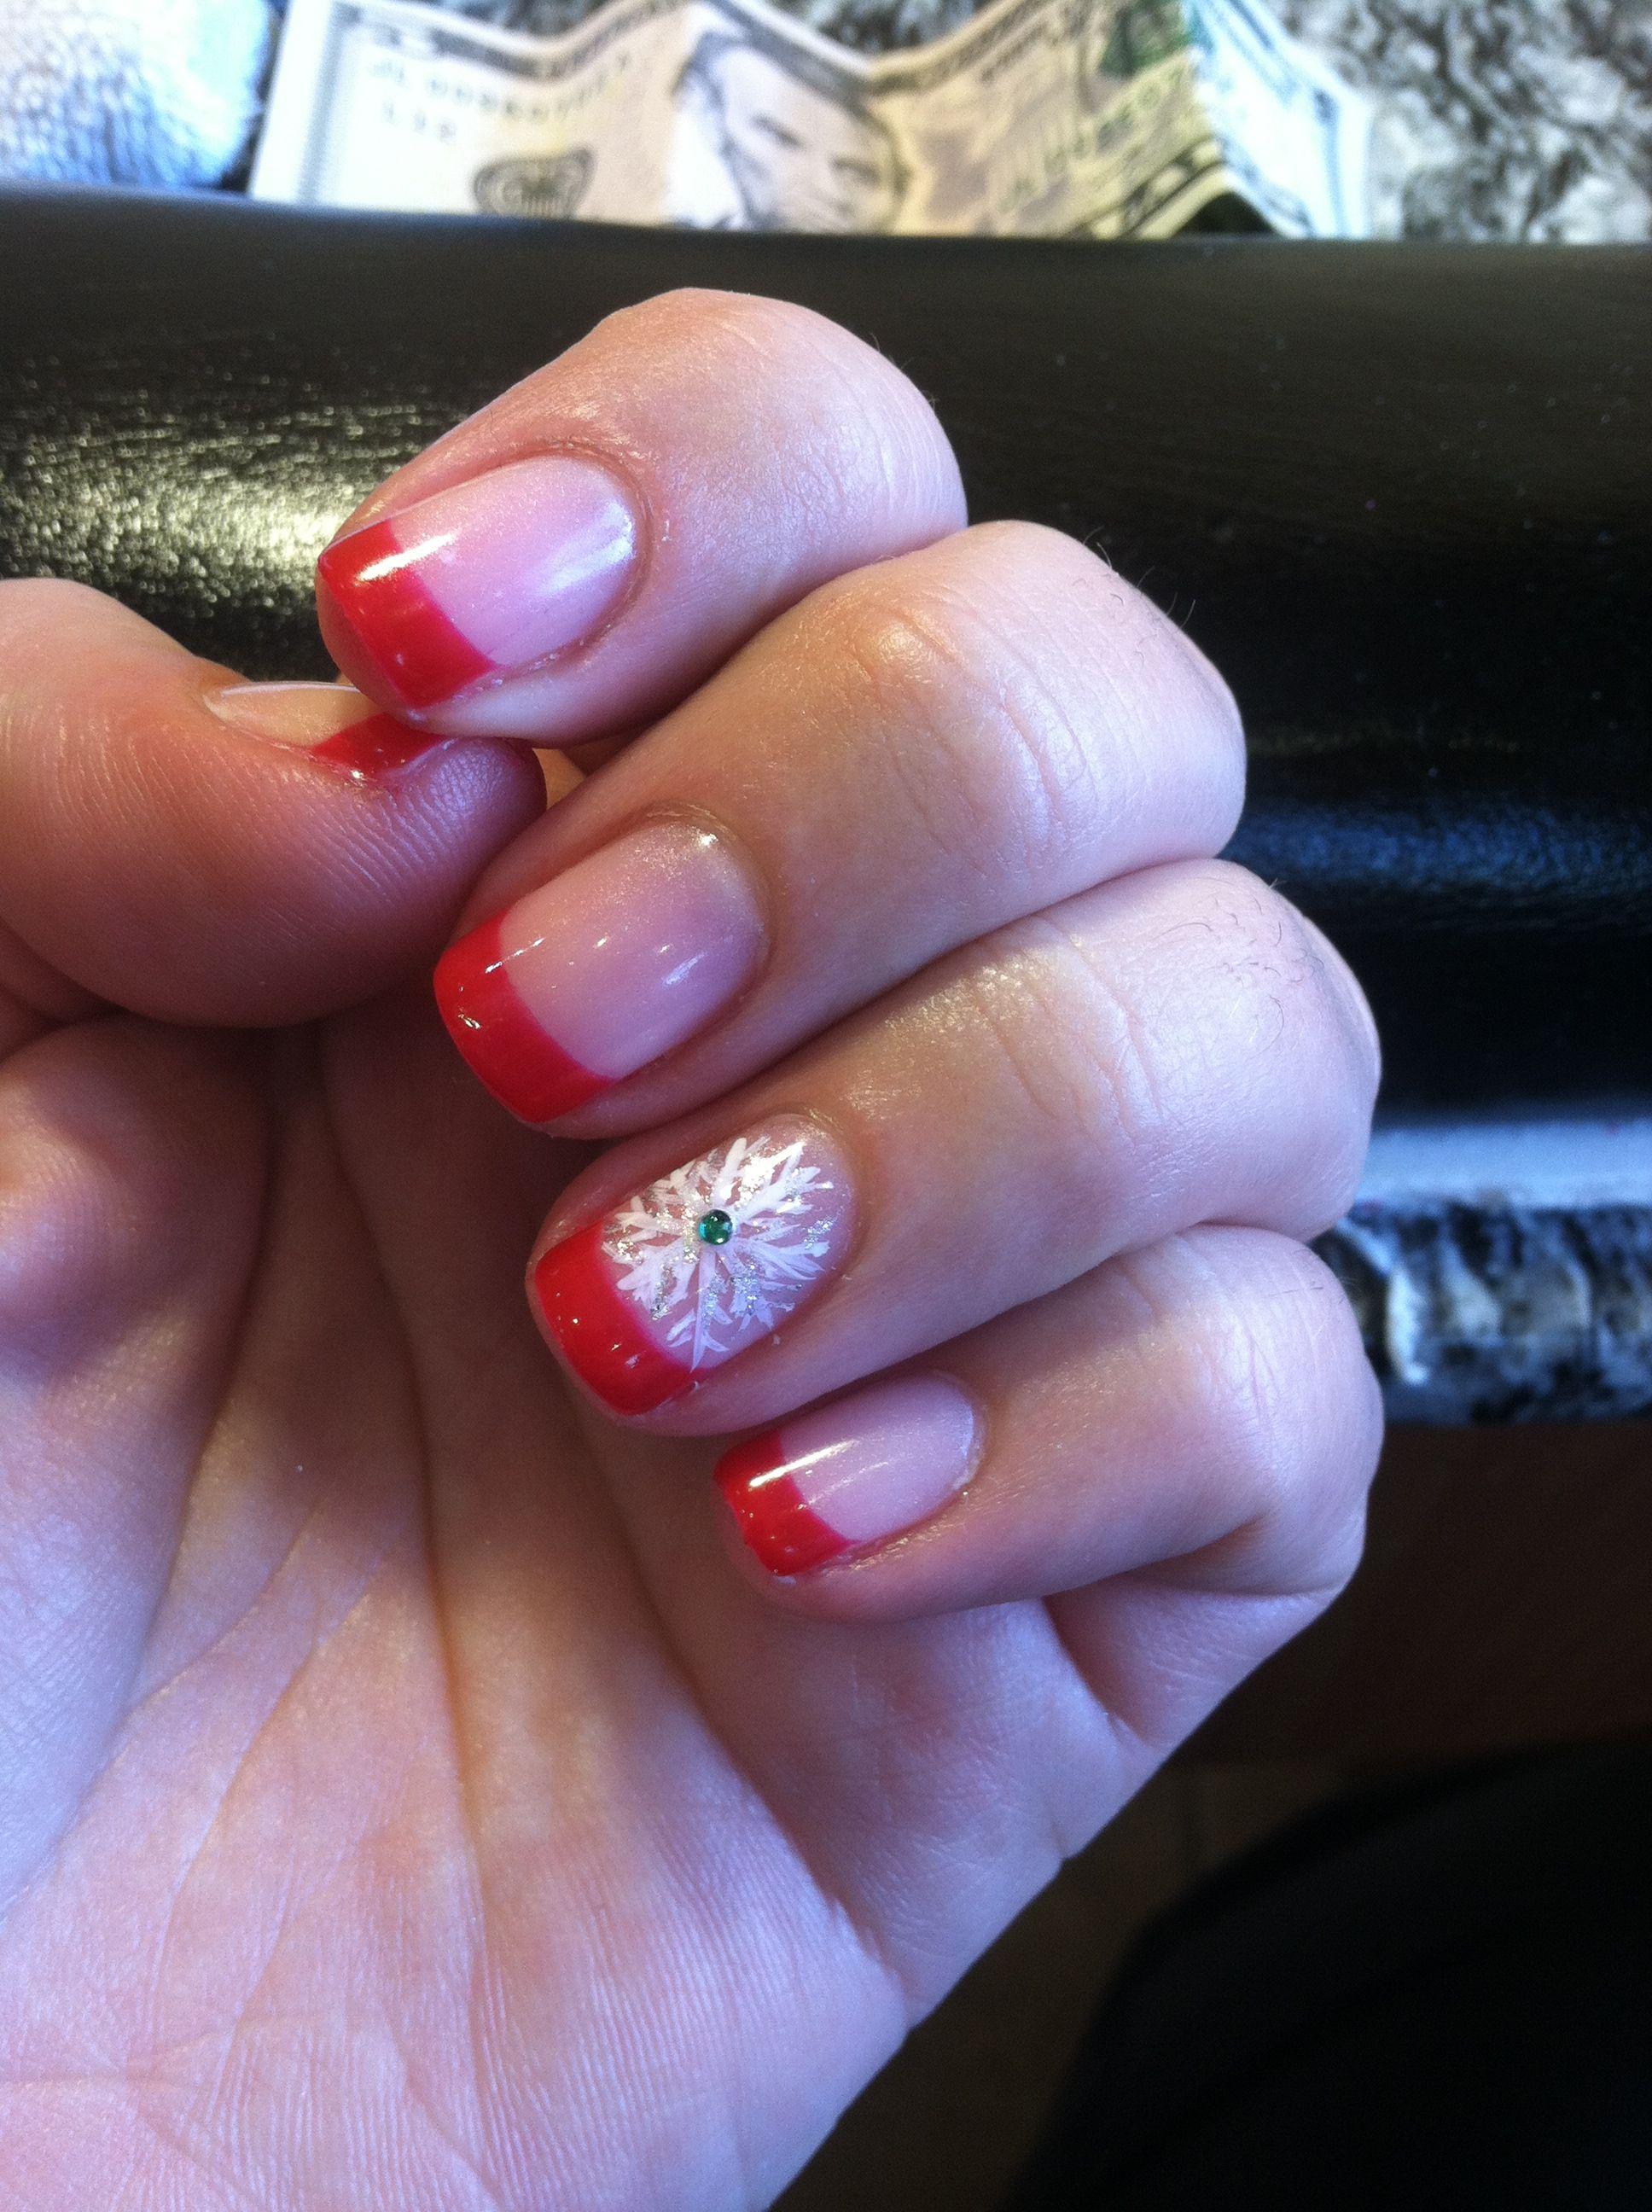 Red tip snowflake accent nail gel polish   Mani/Pedi ideas ...